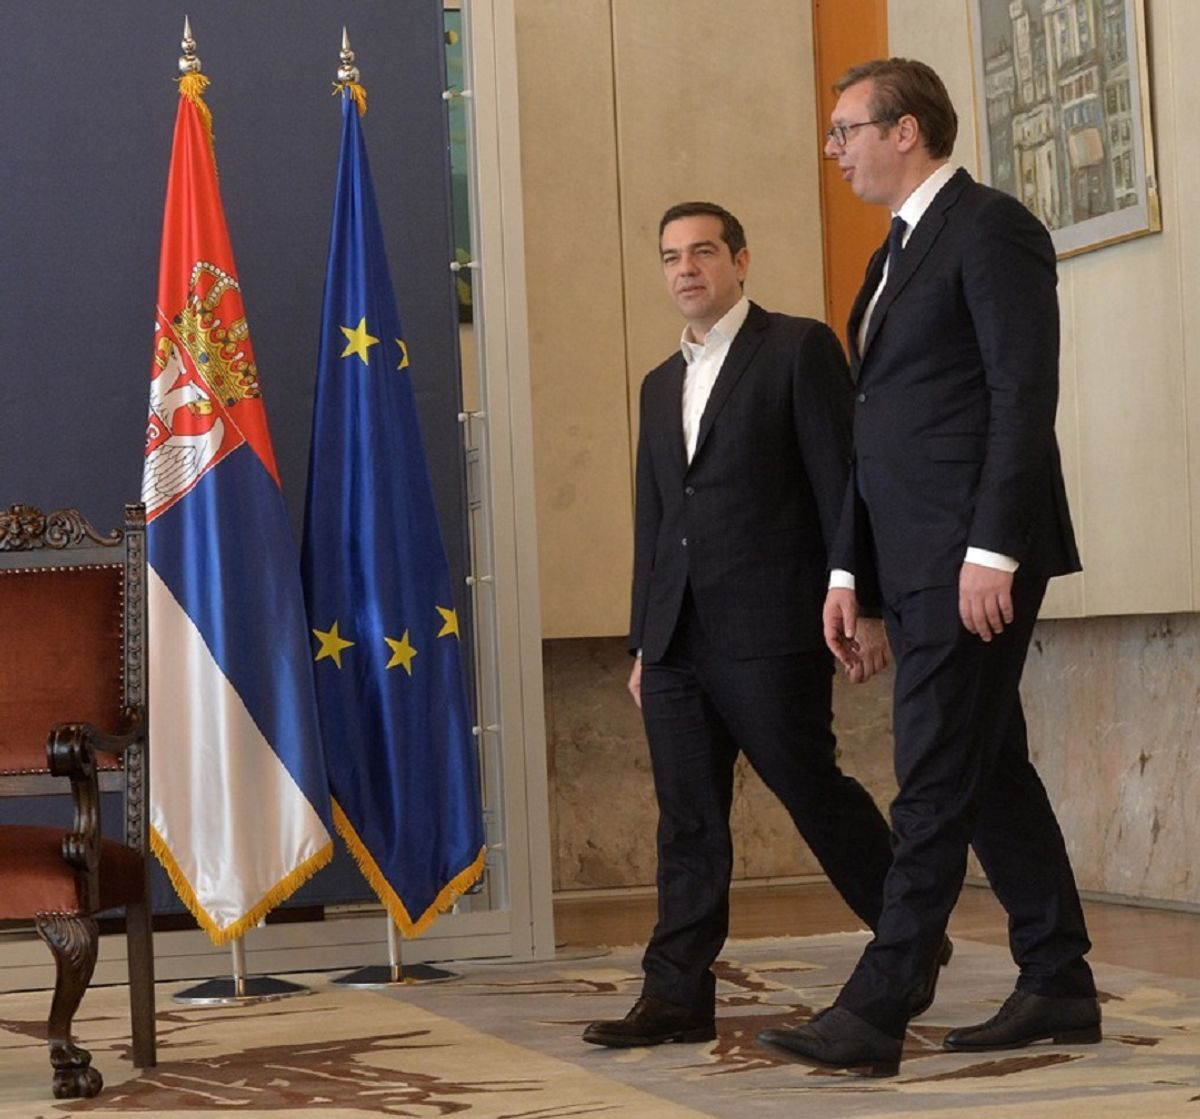 Sastanak sa predsednikom Vlade Republike Grčke